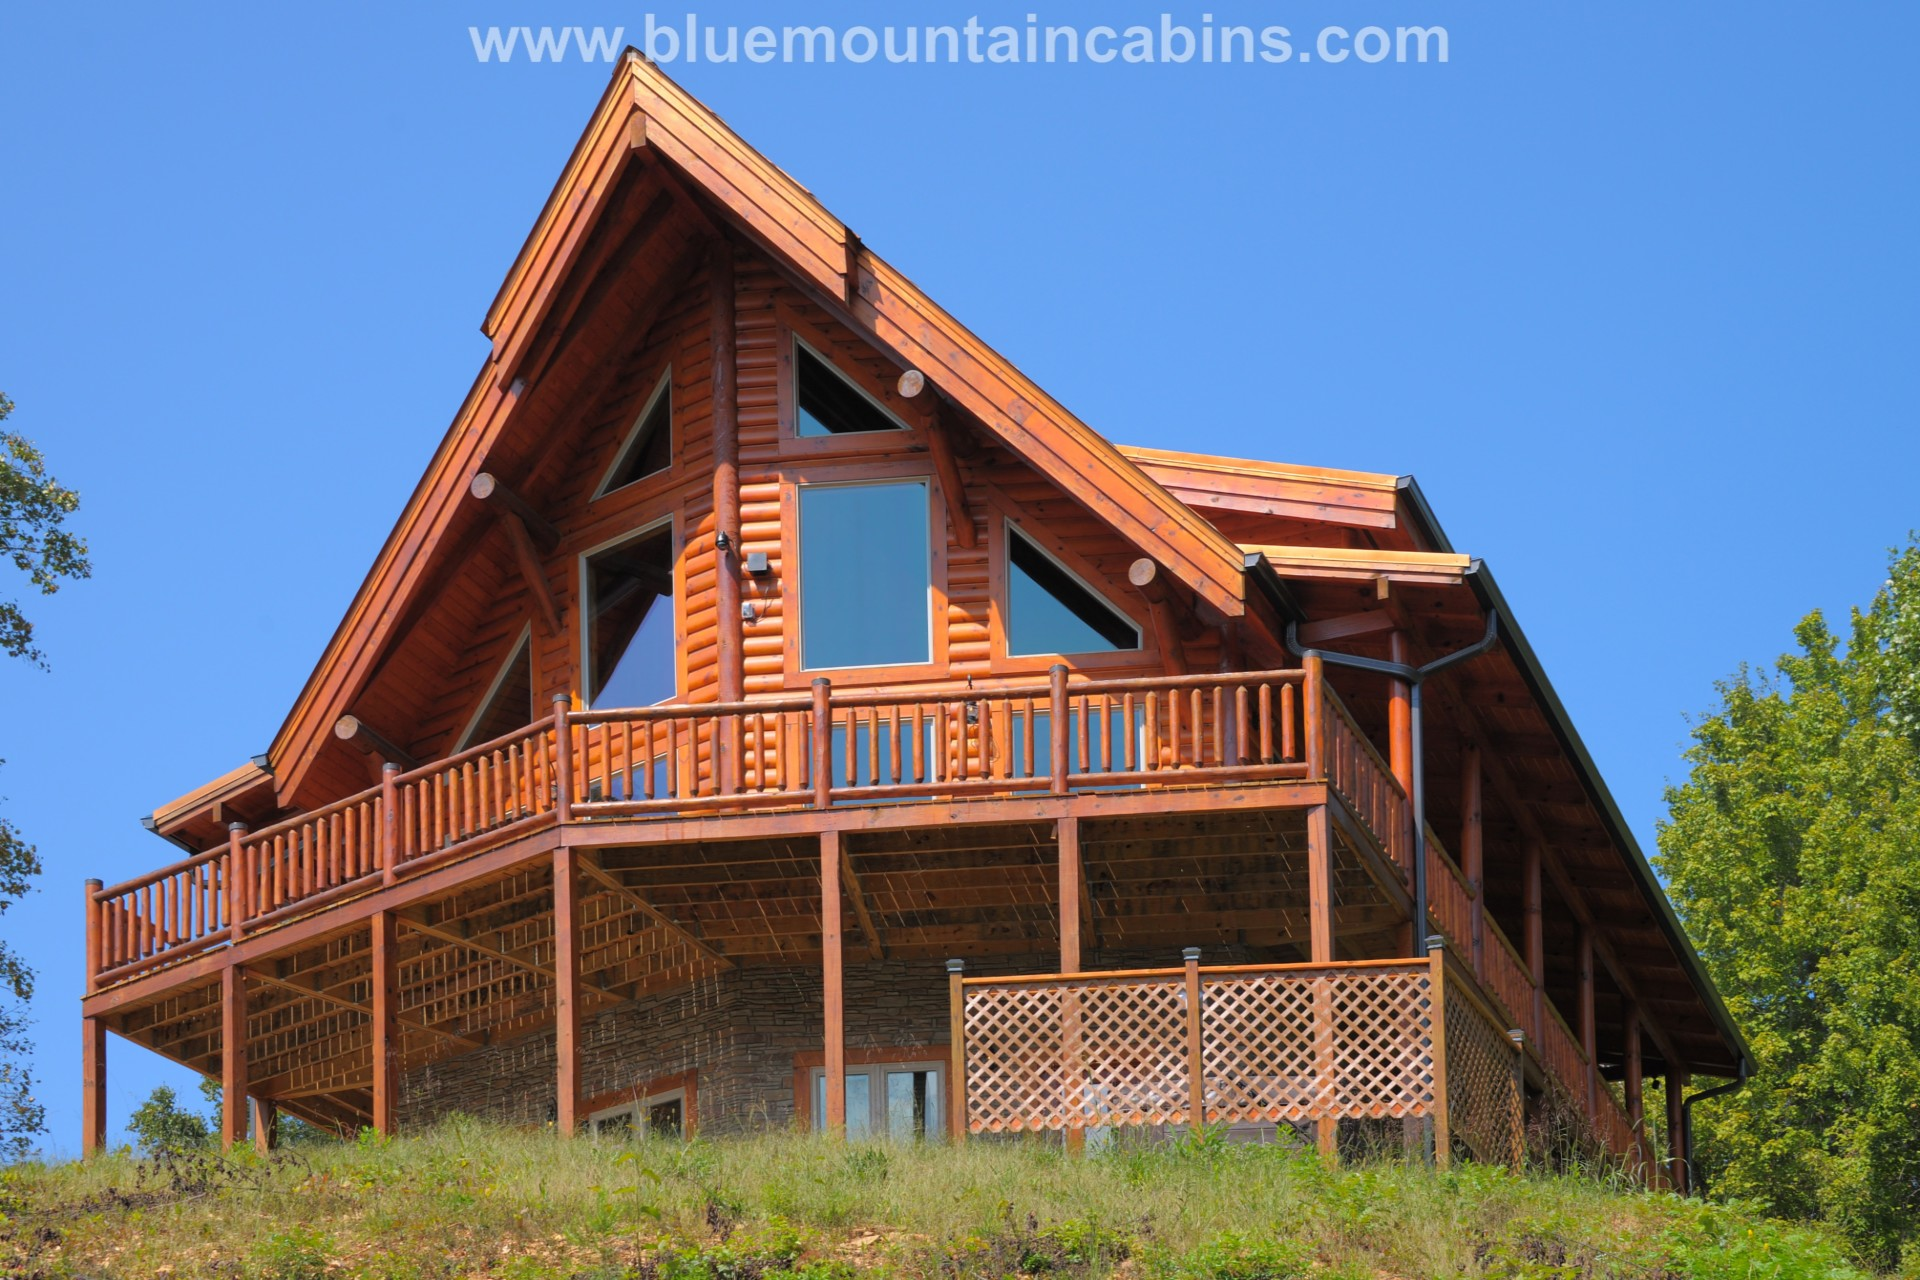 Ridge View Lodge cabin in the Smokies 5 bedroom